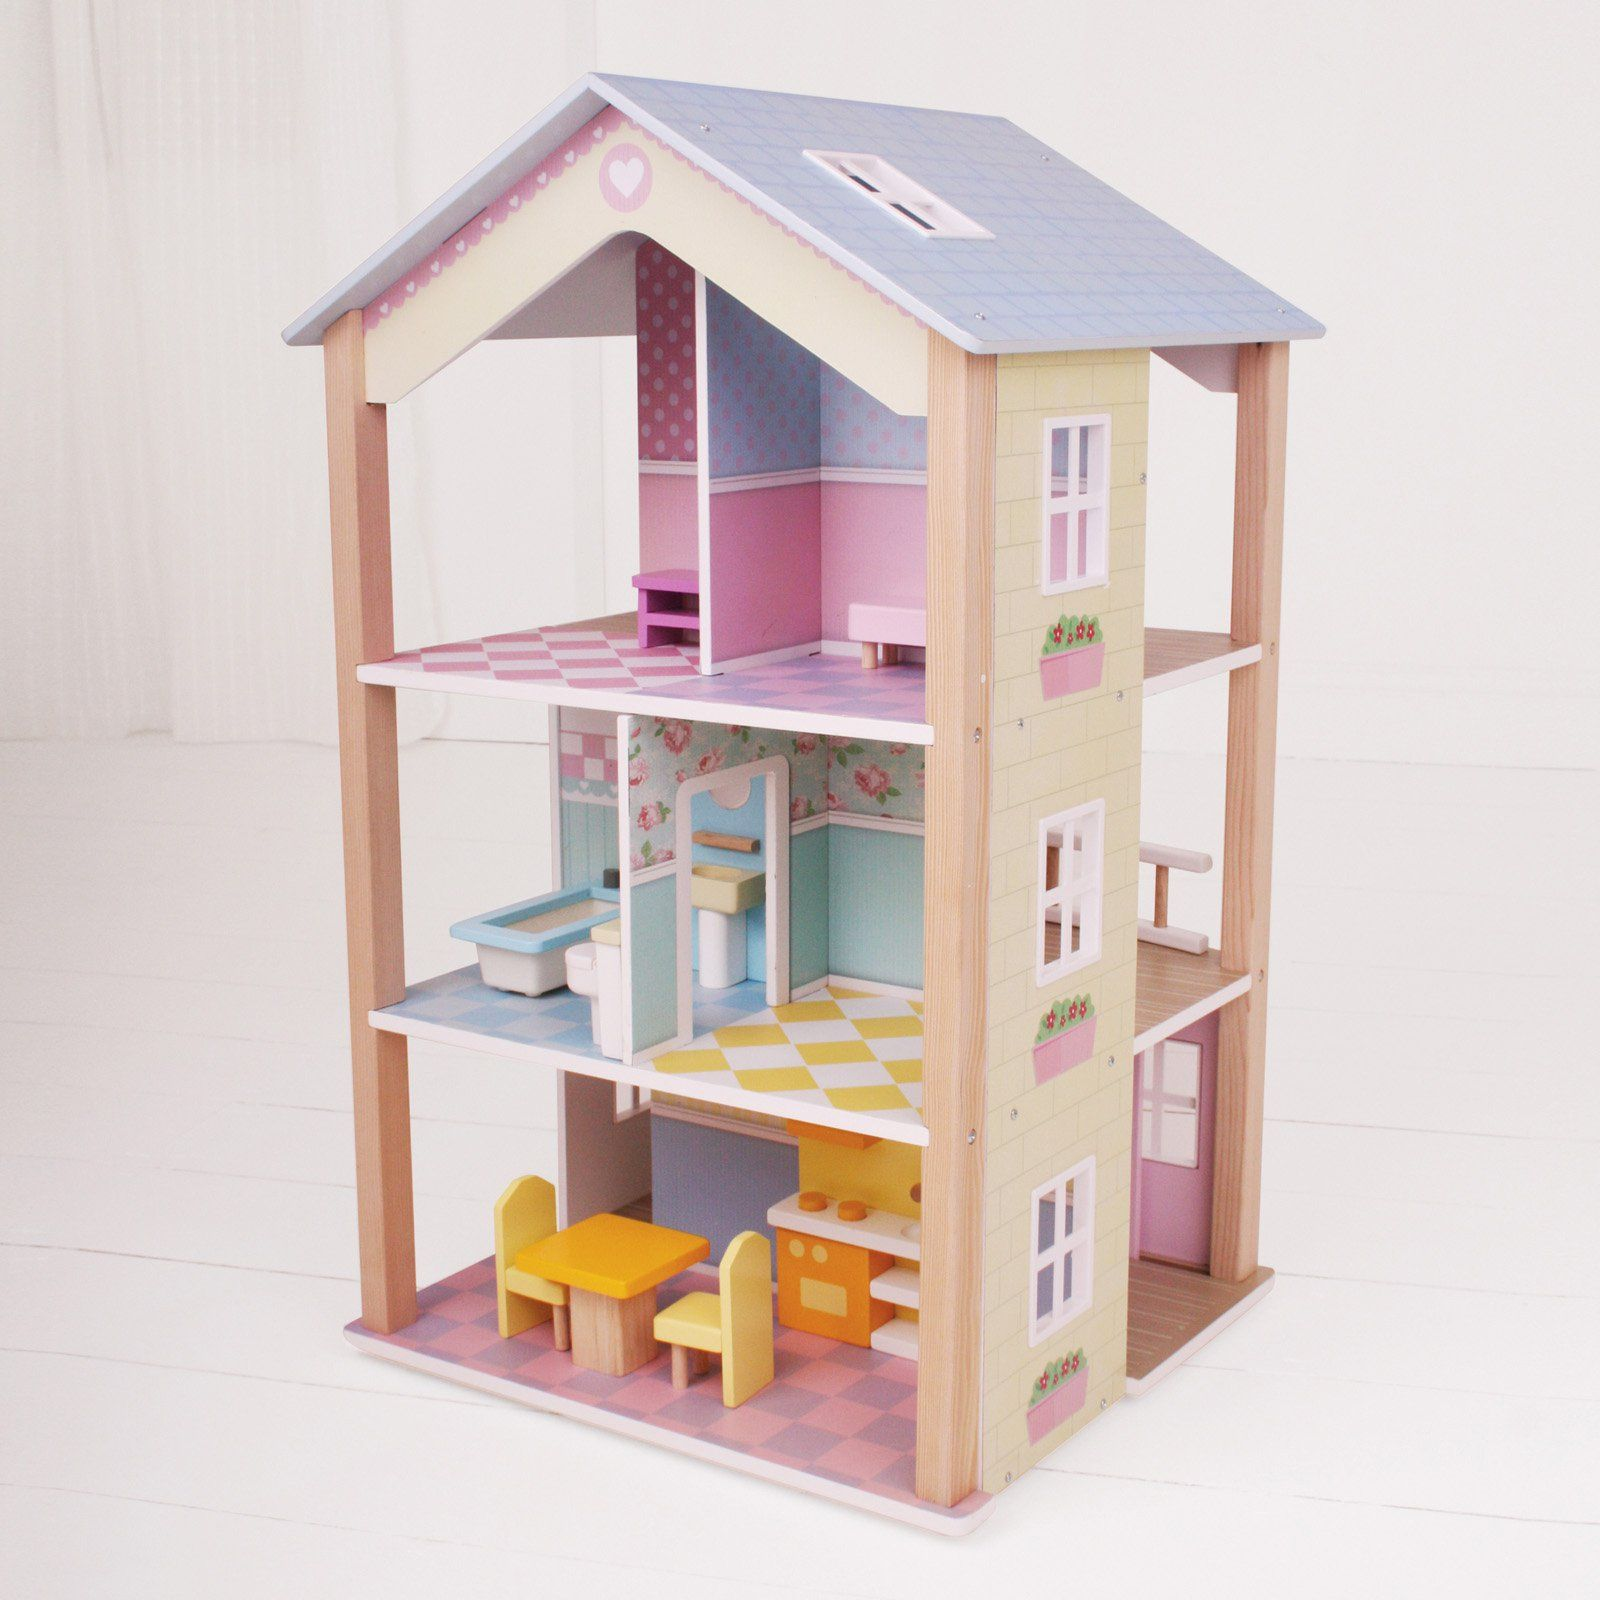 Big Jigs Manhattan Townhome Dollhouse | From Hayneedle.com